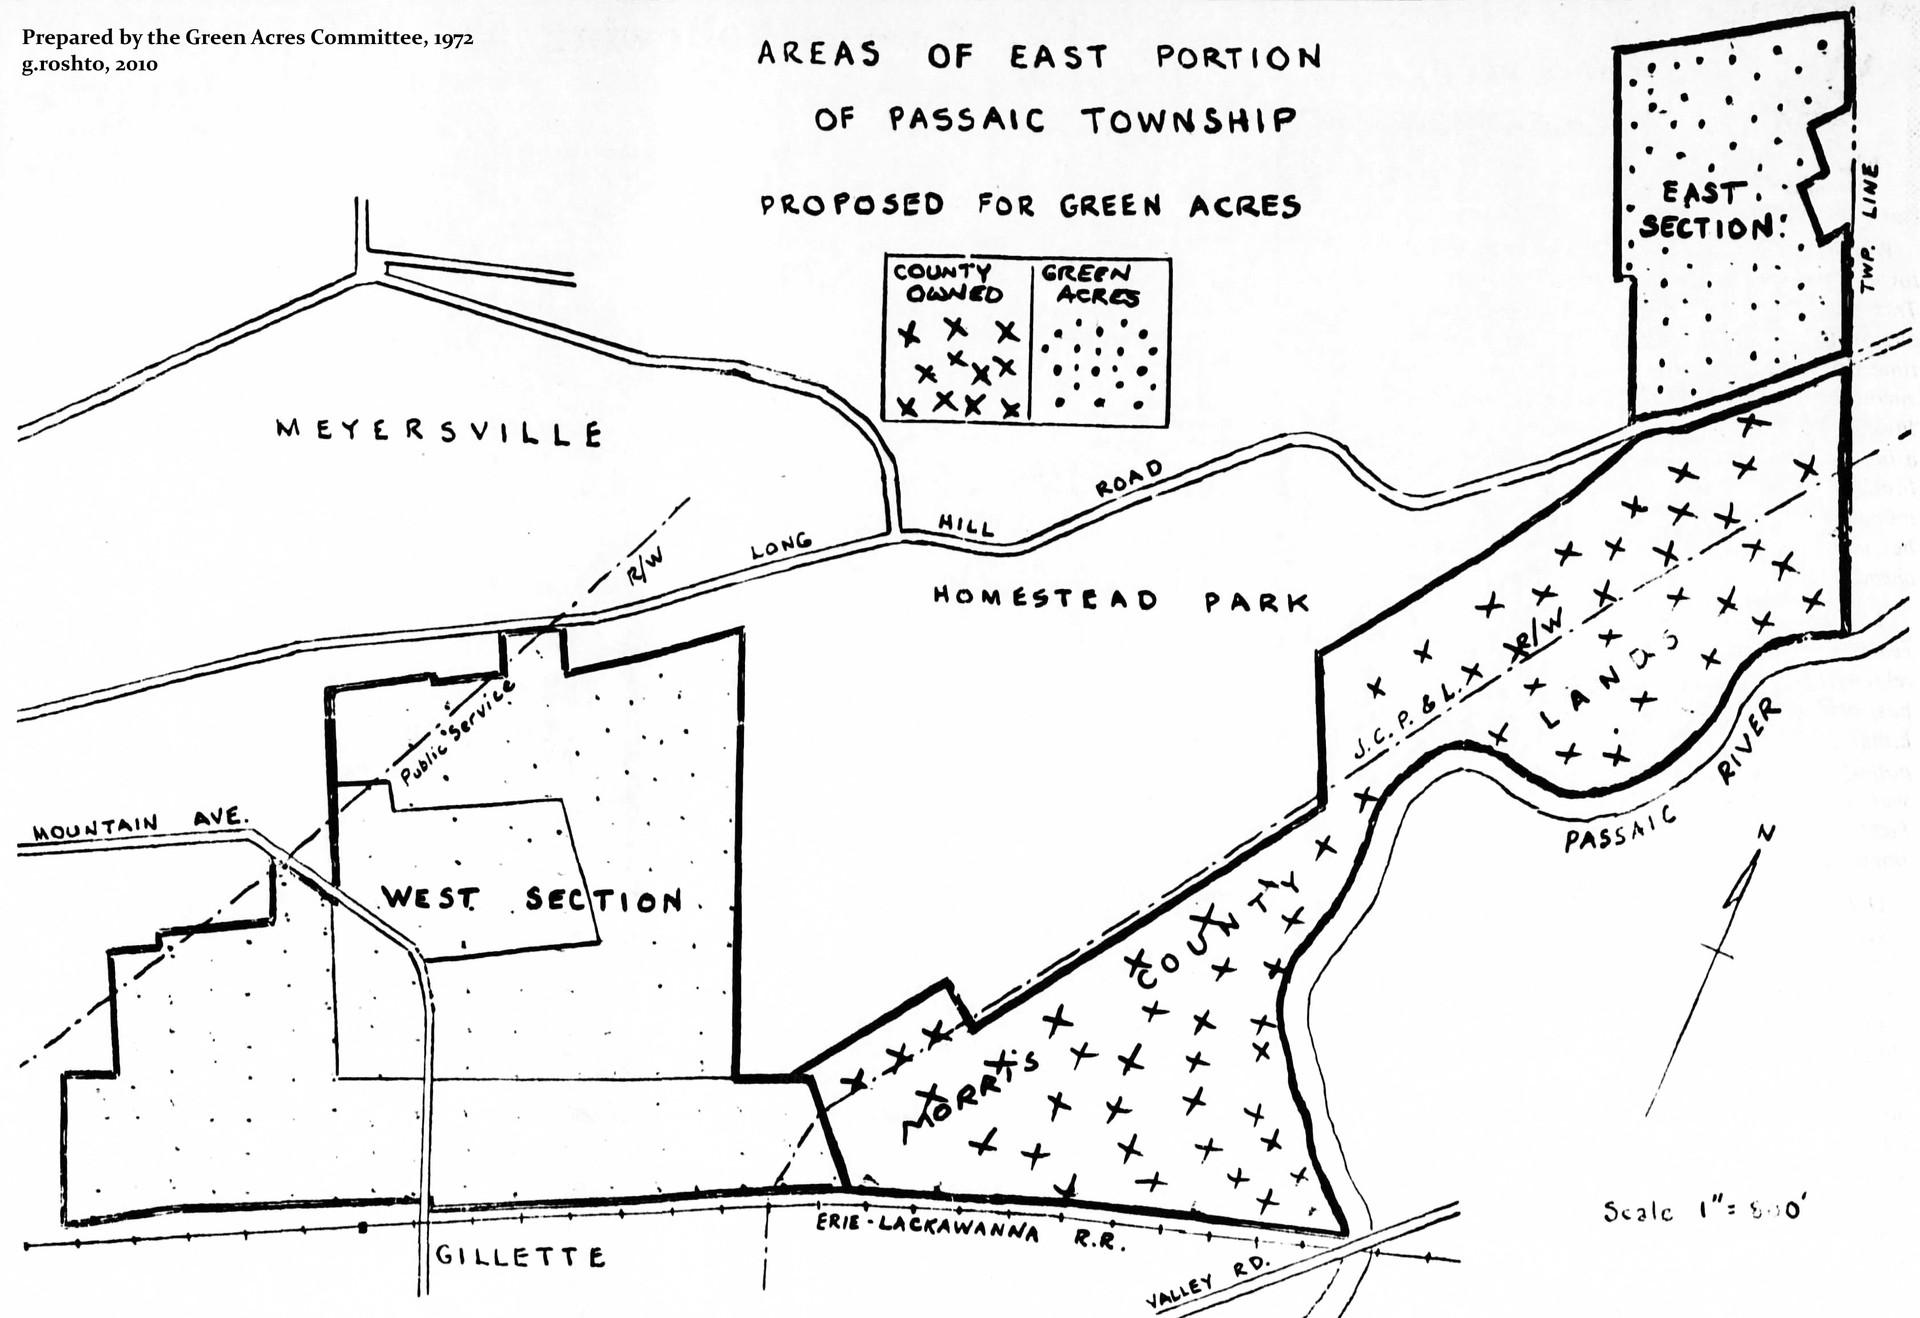 1972 Planning Map